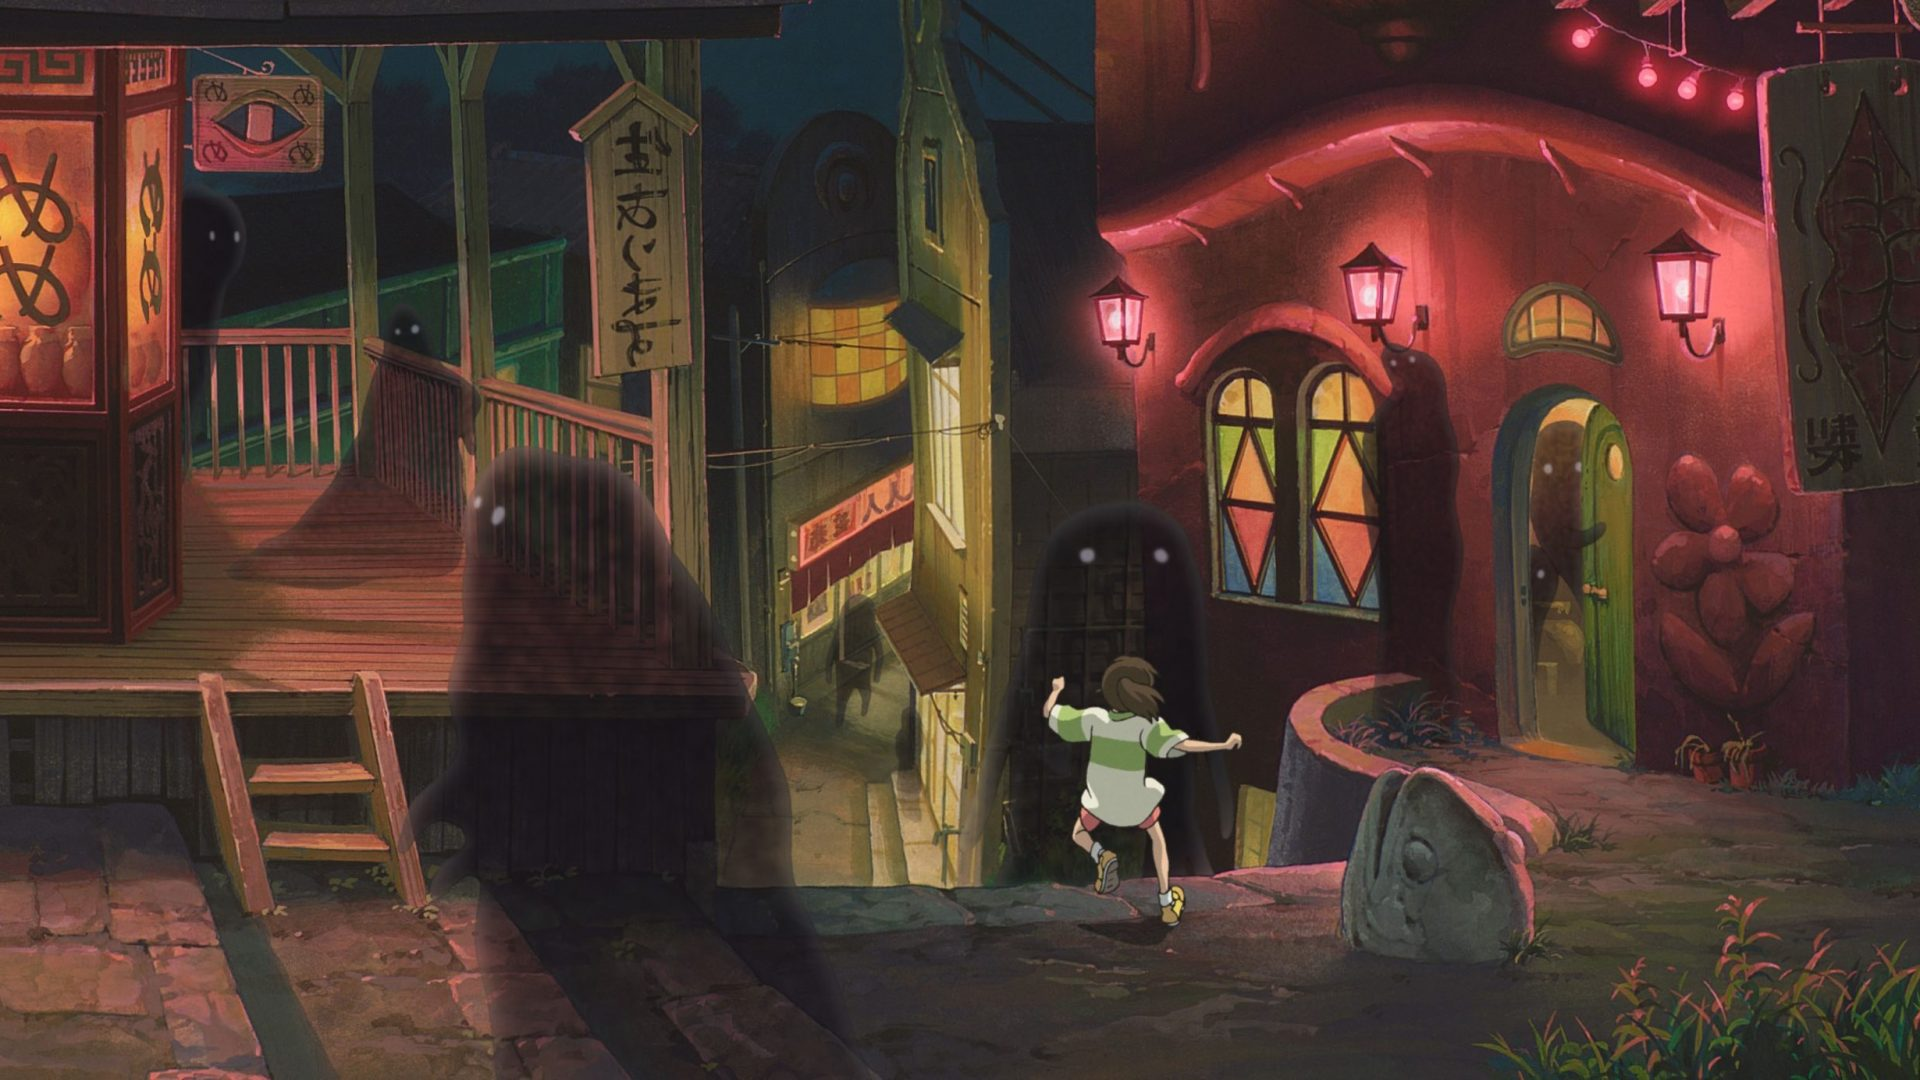 La città incantata - studio Ghibli's background.